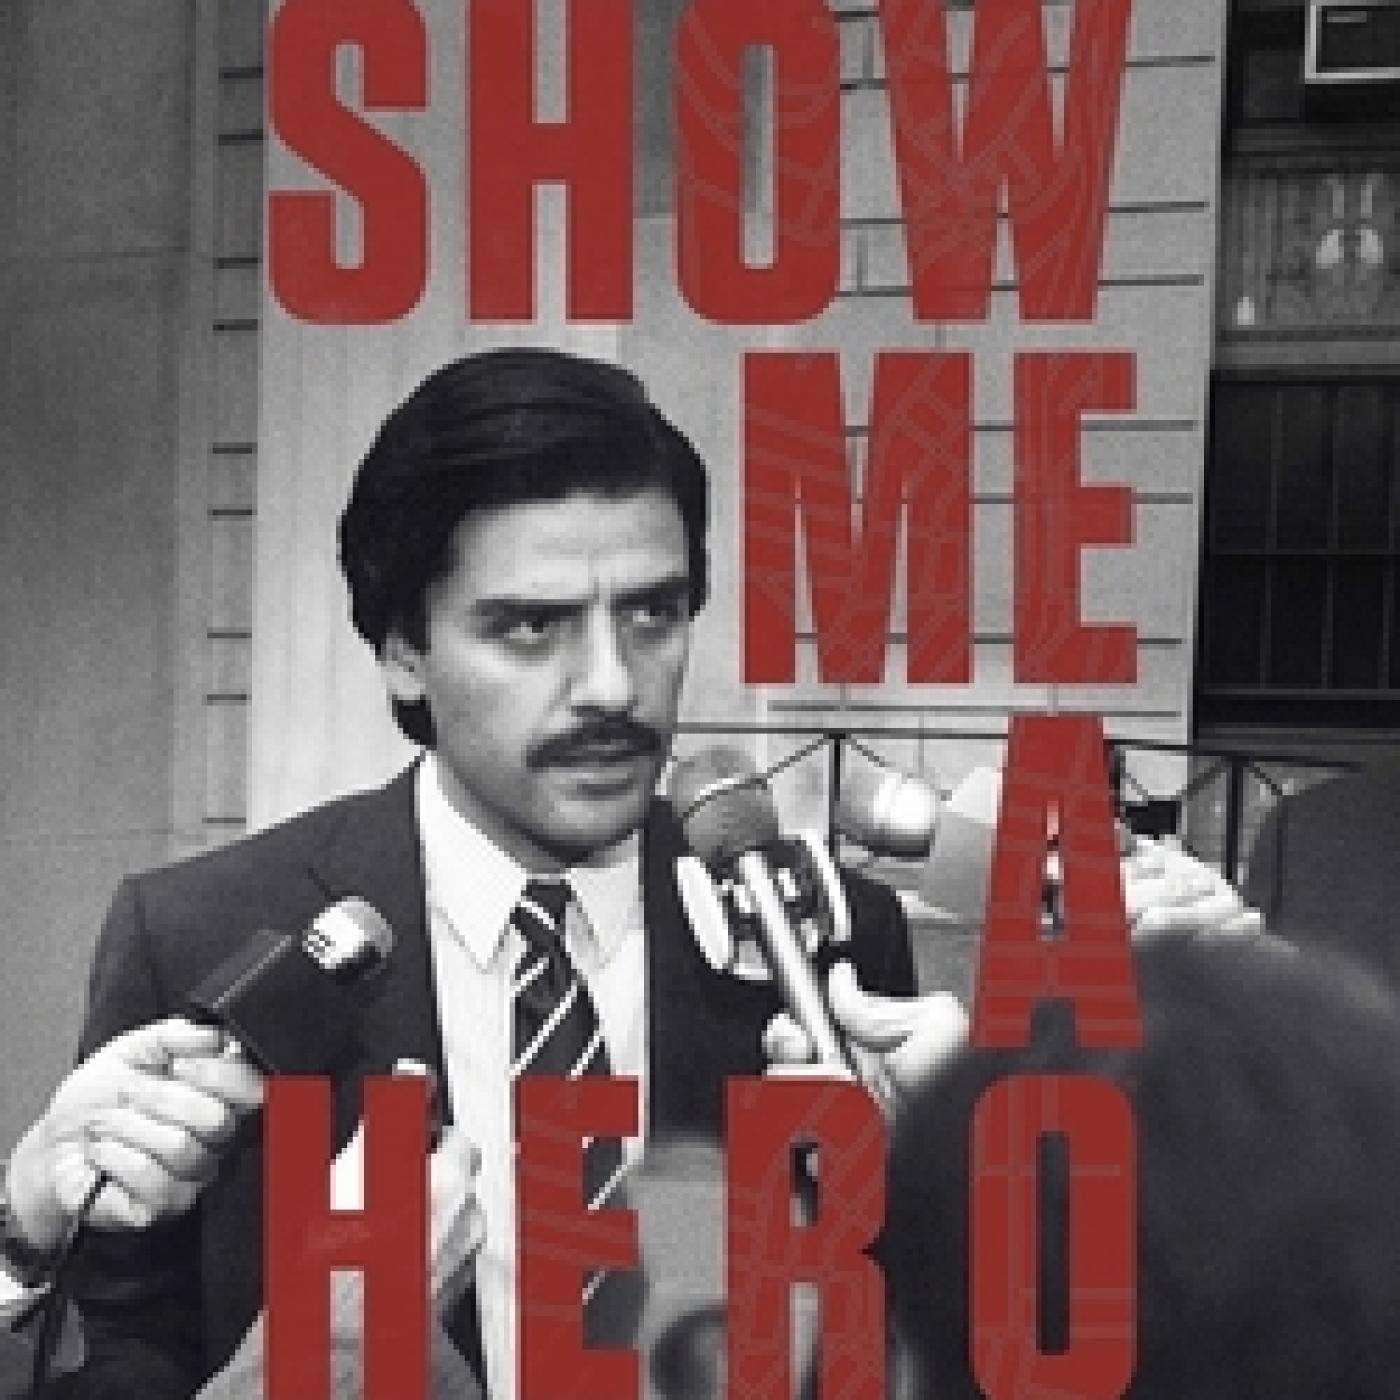 2x04 - Show me a hero / Remakes terriblemente innecesarios / Spin off: La calle Laurel